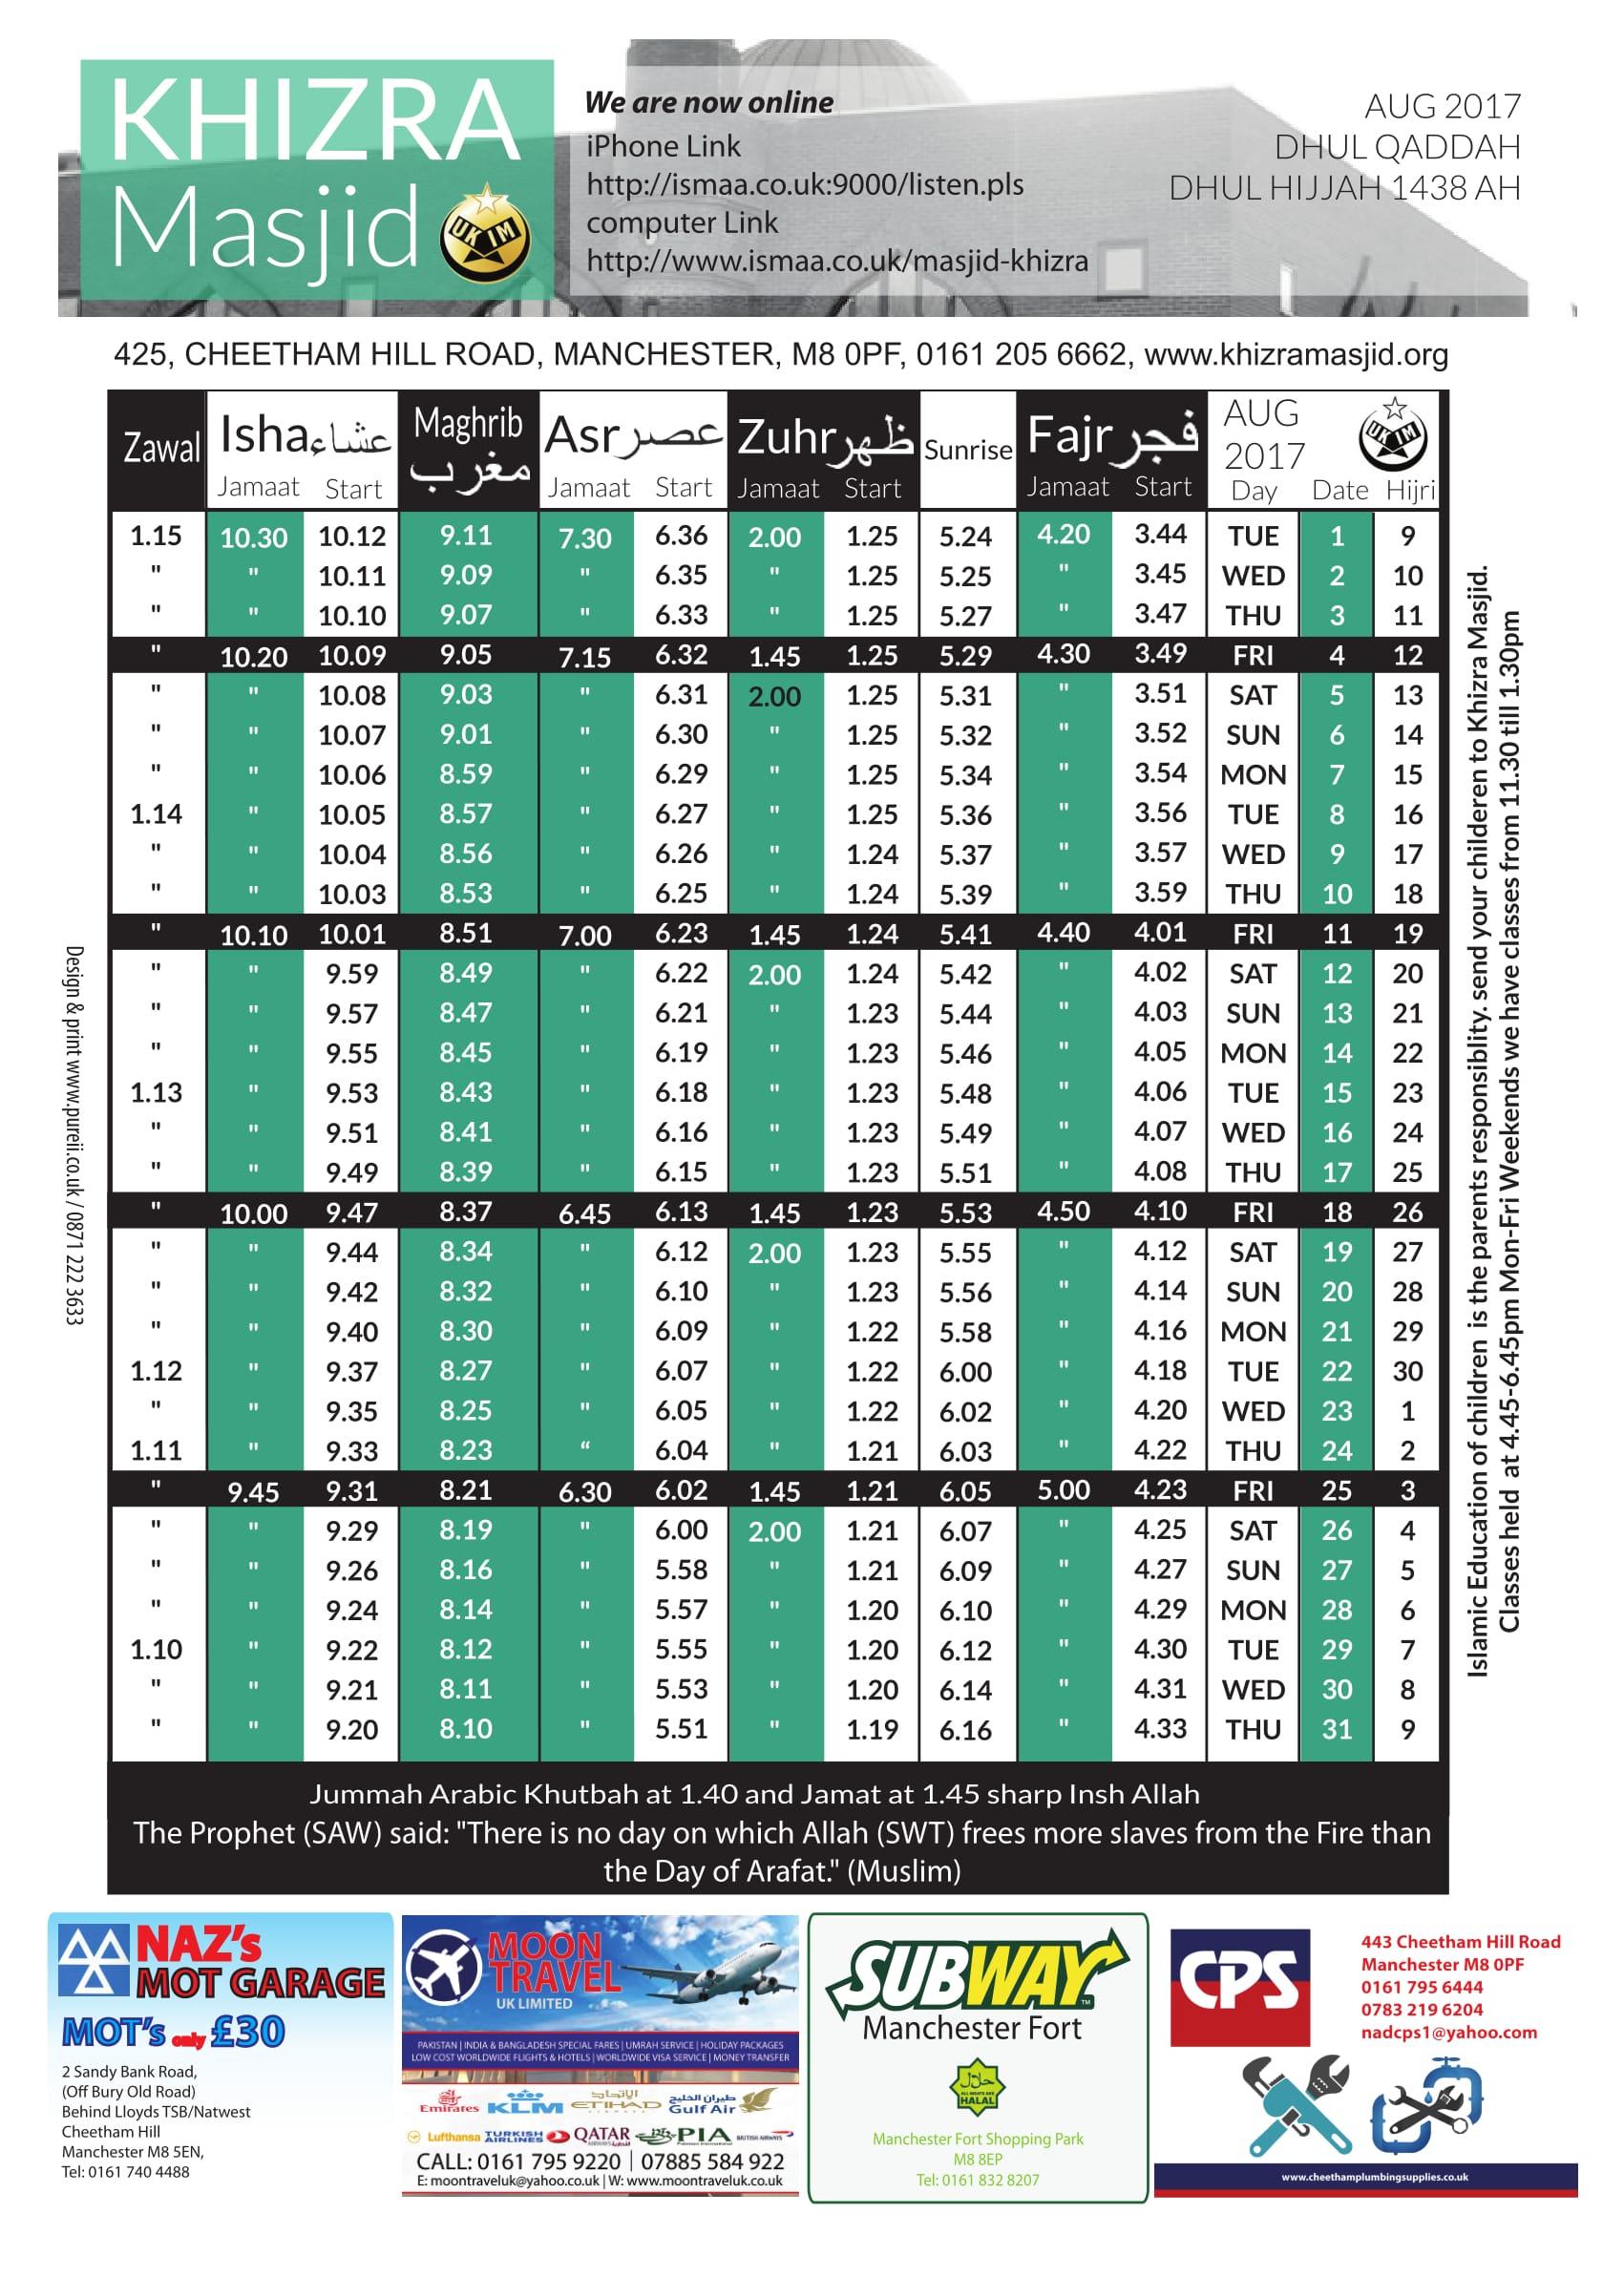 A4 Khizra Masjid MAR 2017-1